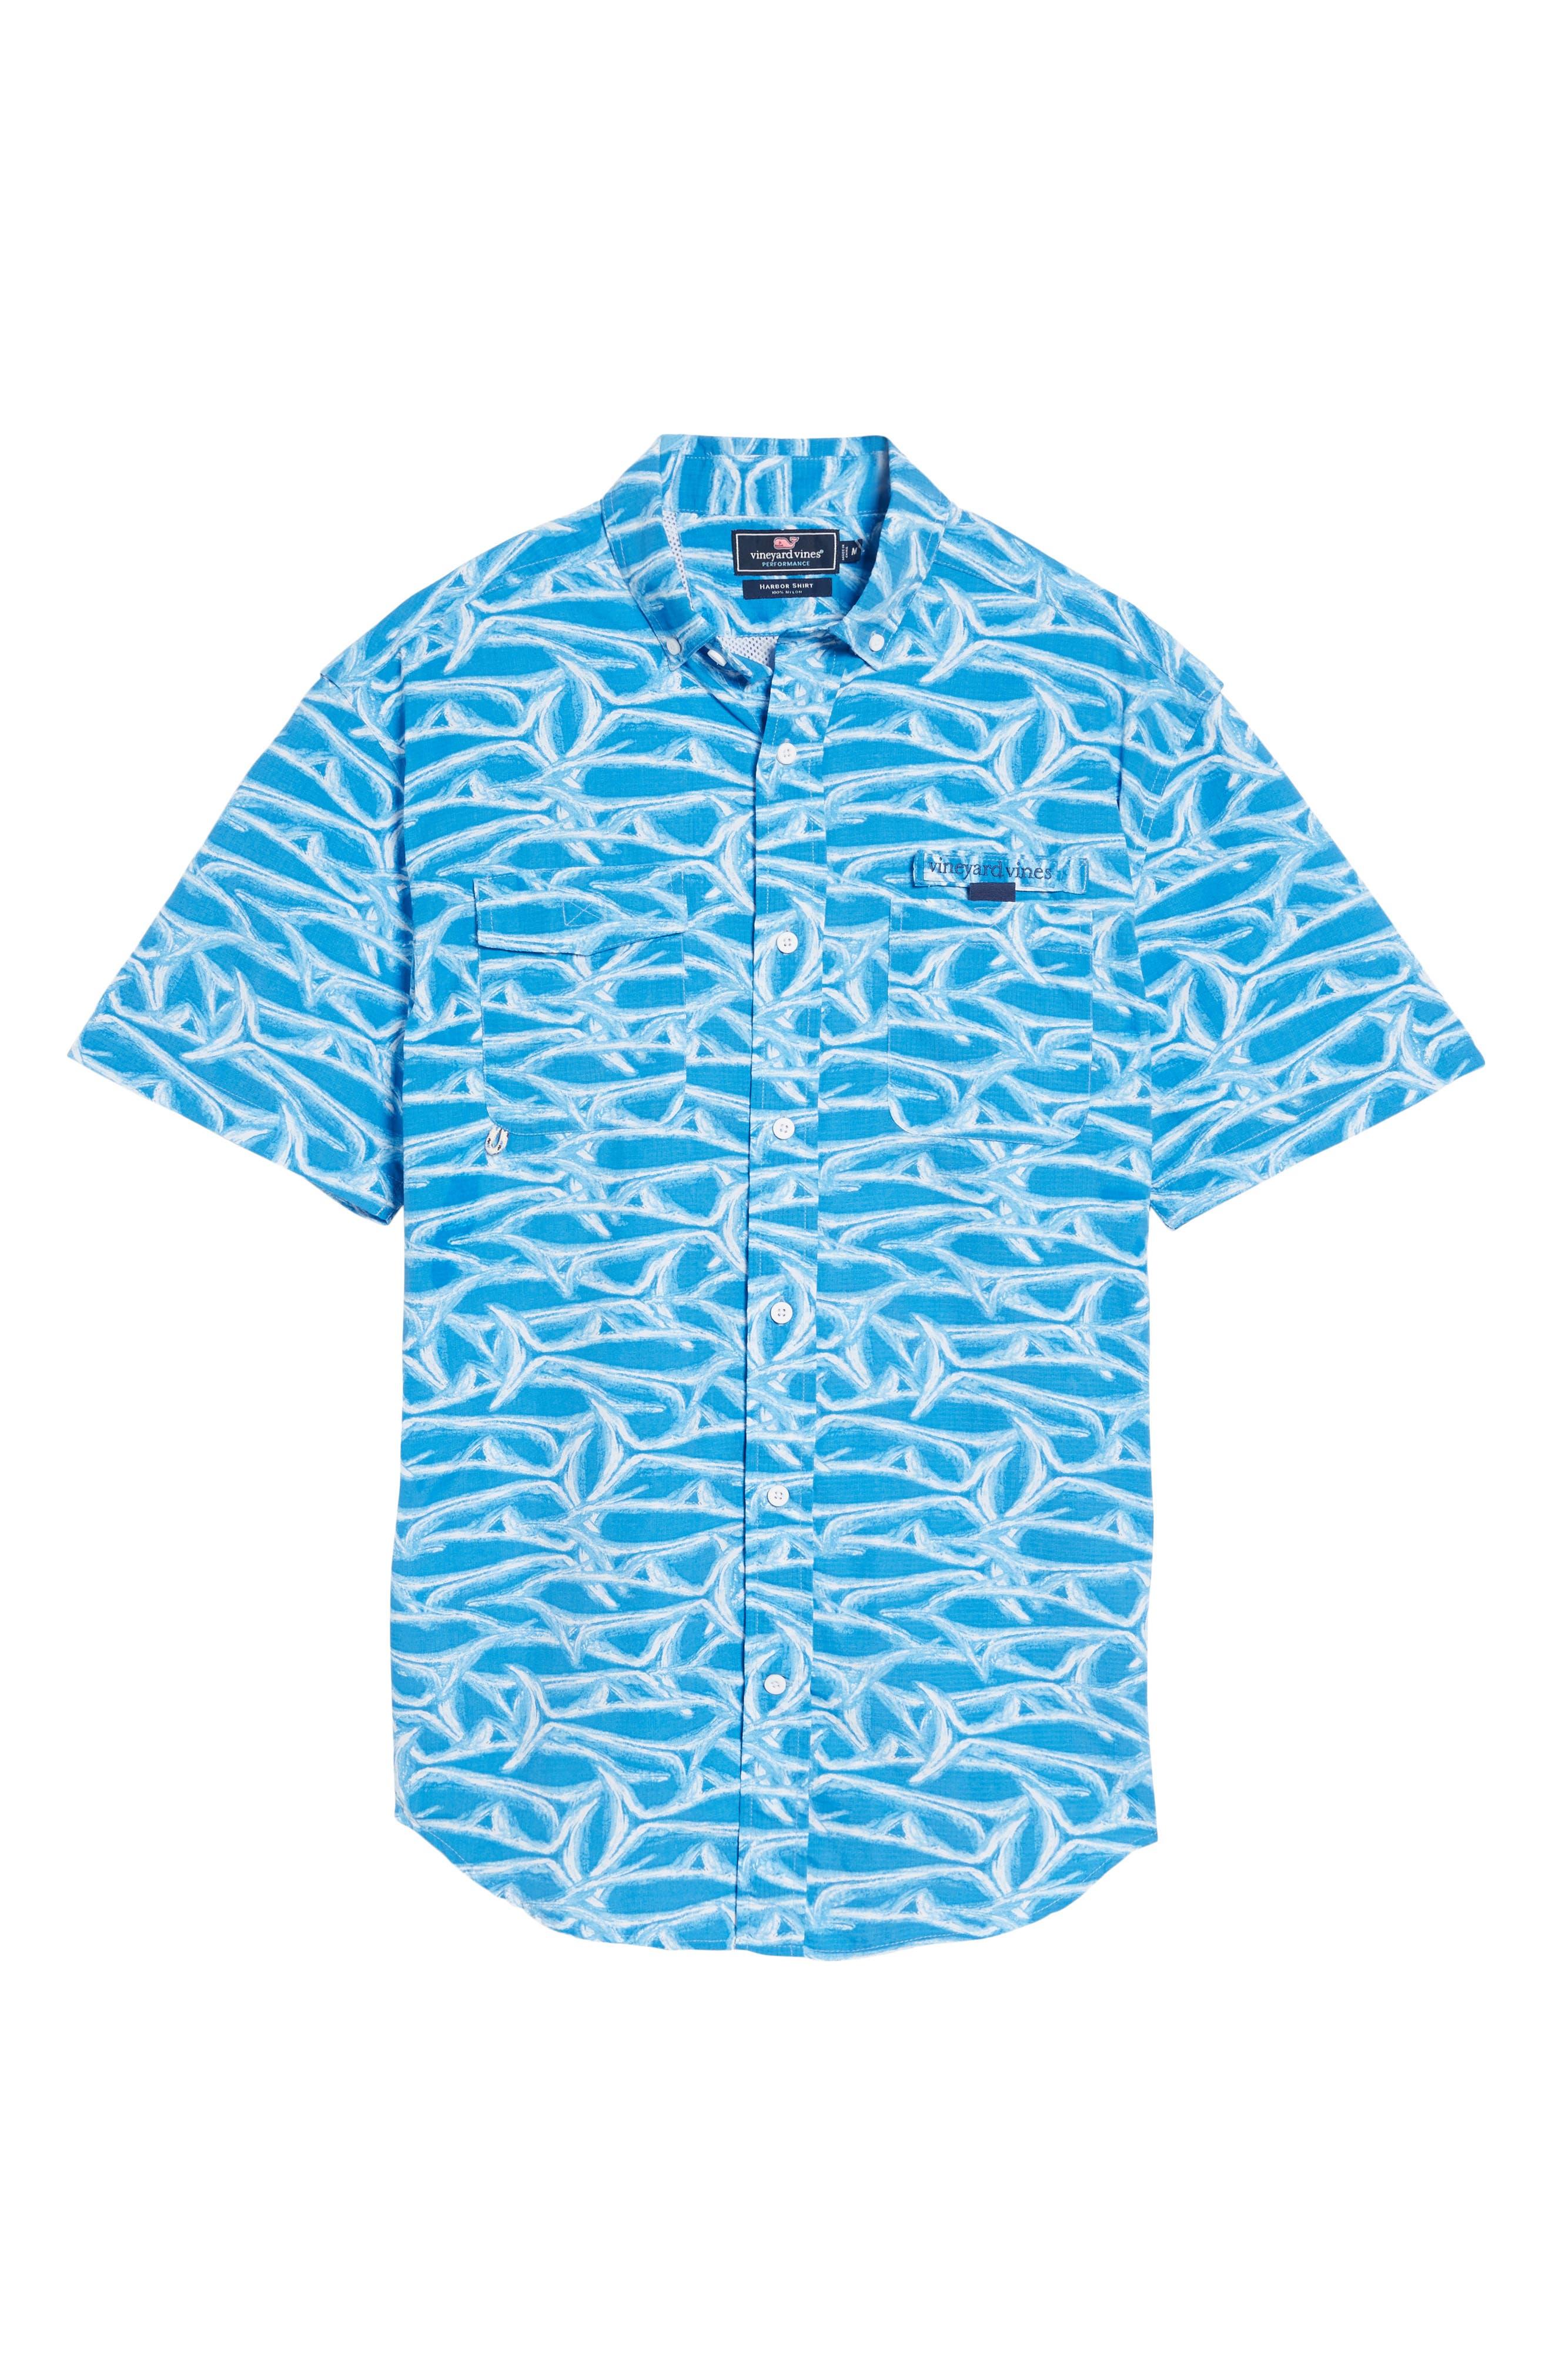 Harbor Brushed Marlin Fishing Shirt,                             Alternate thumbnail 6, color,                             496